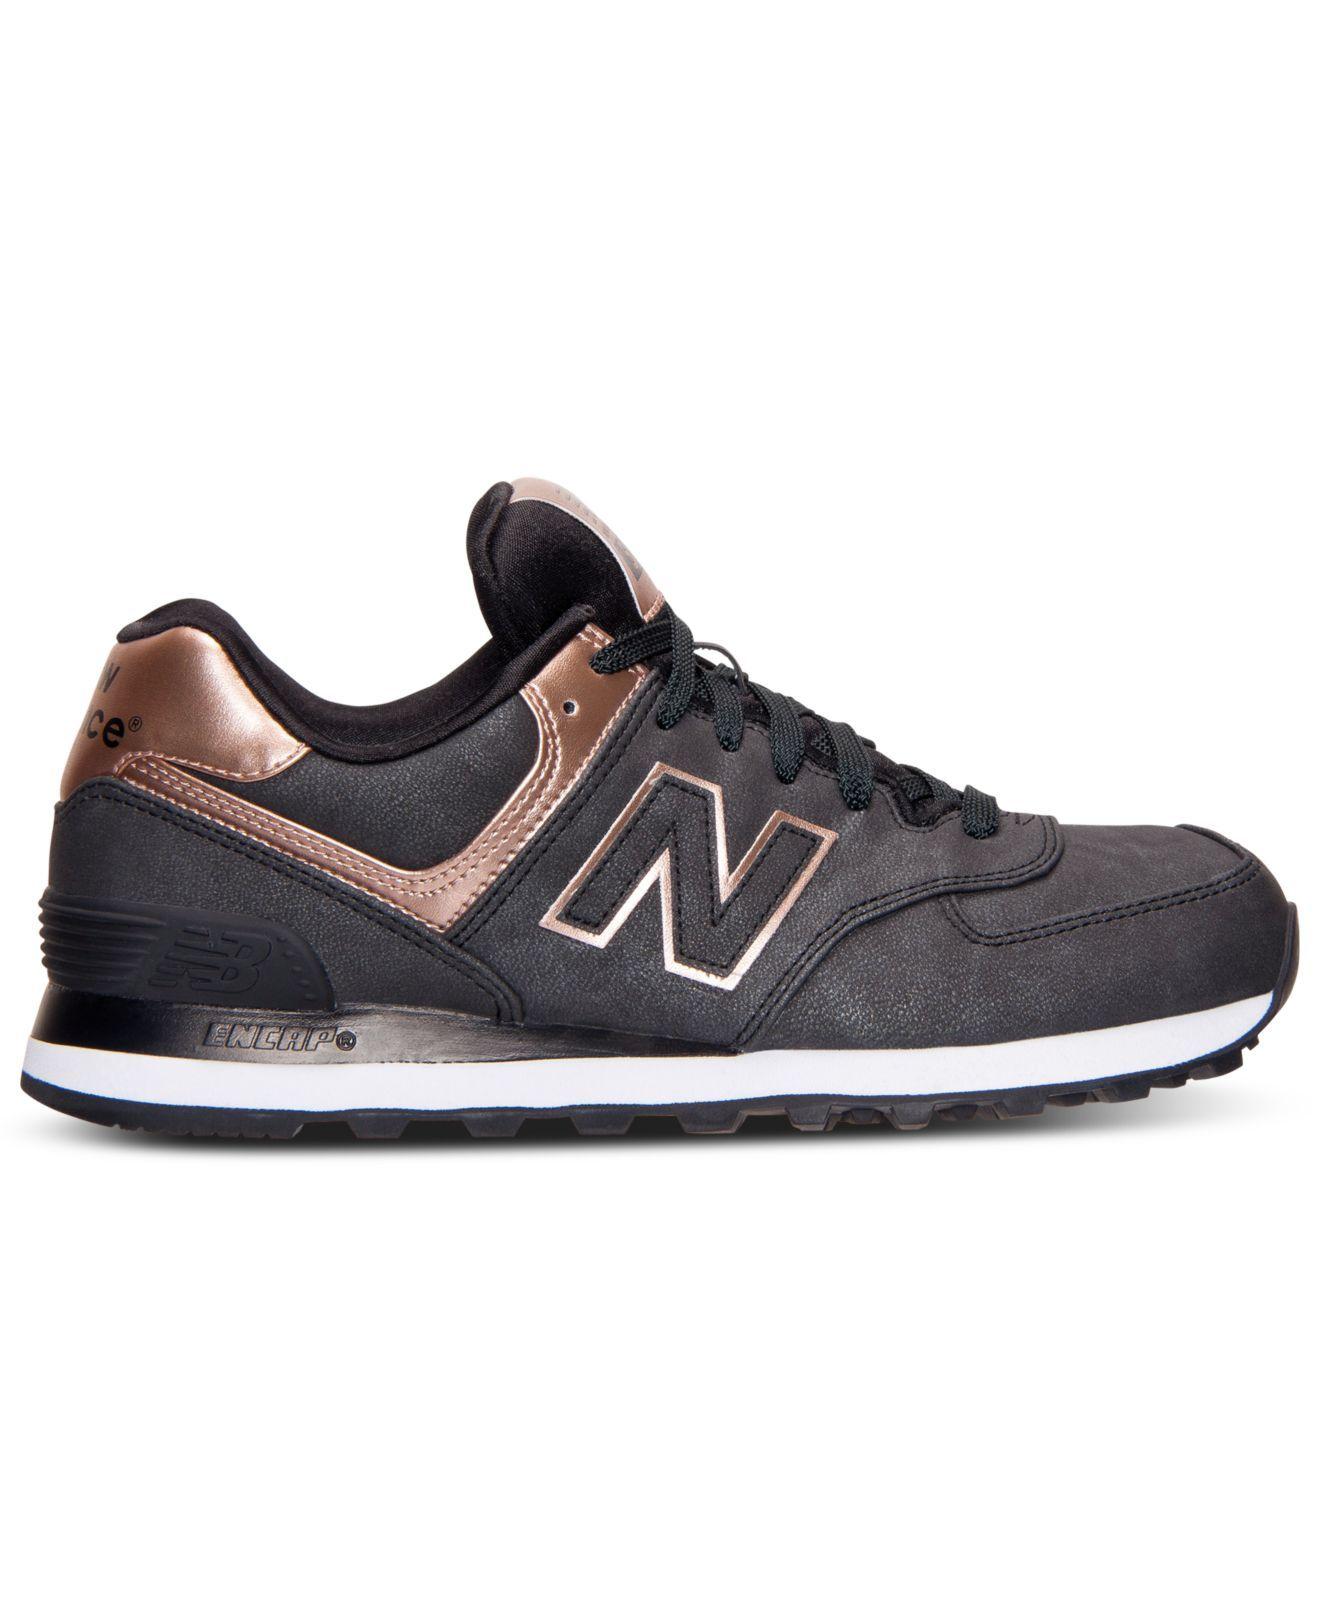 chaussure new balance rose